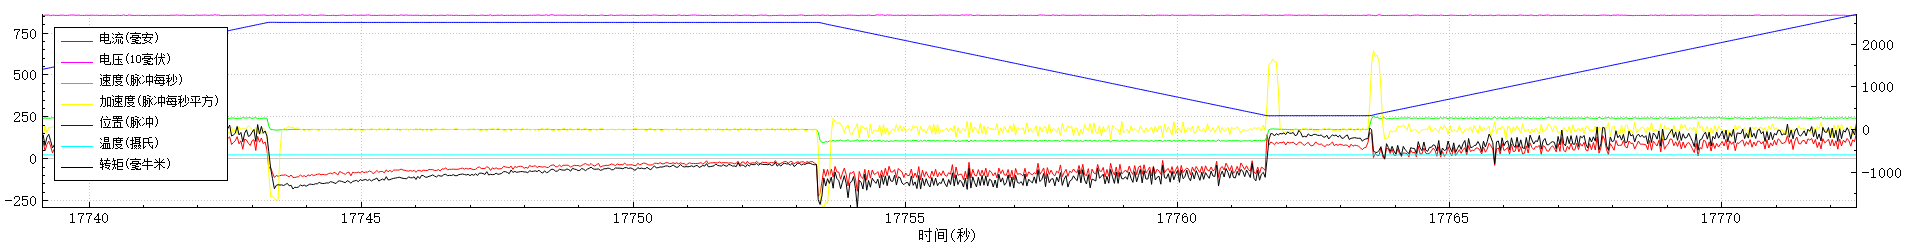 smartservo_curve.png